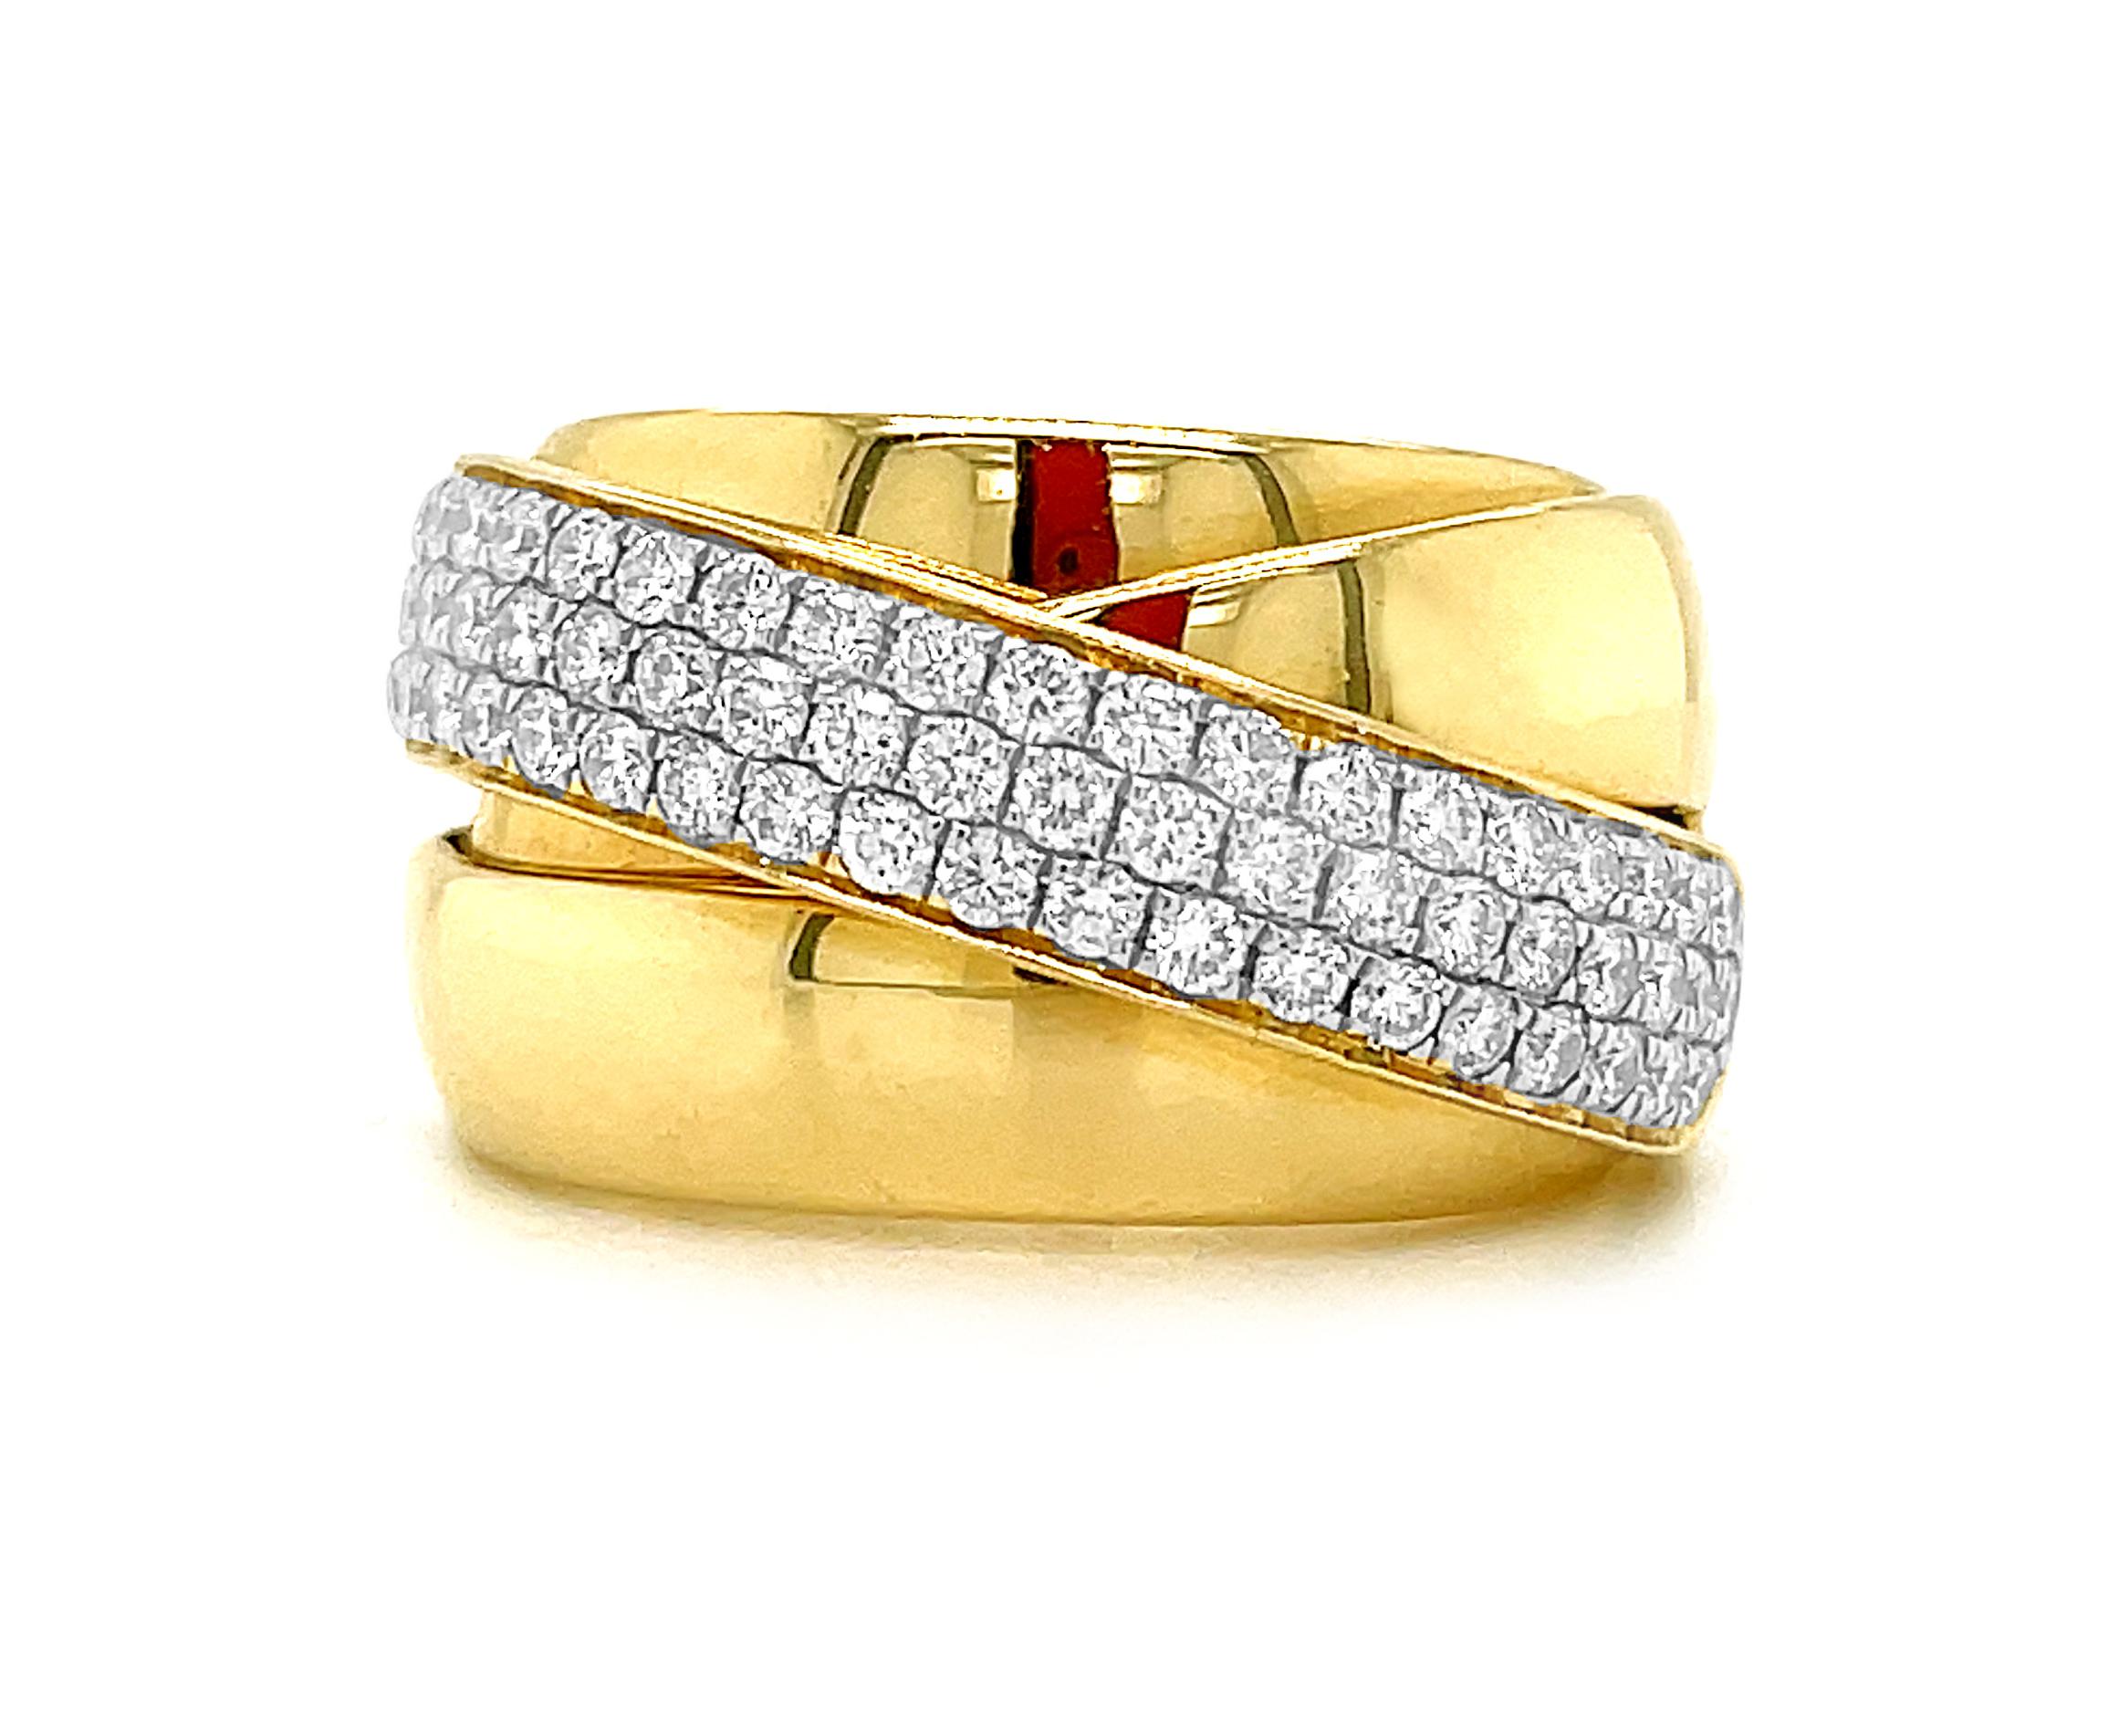 18k Yellow Gold Dress Ring With Brilliant Cut Diamond